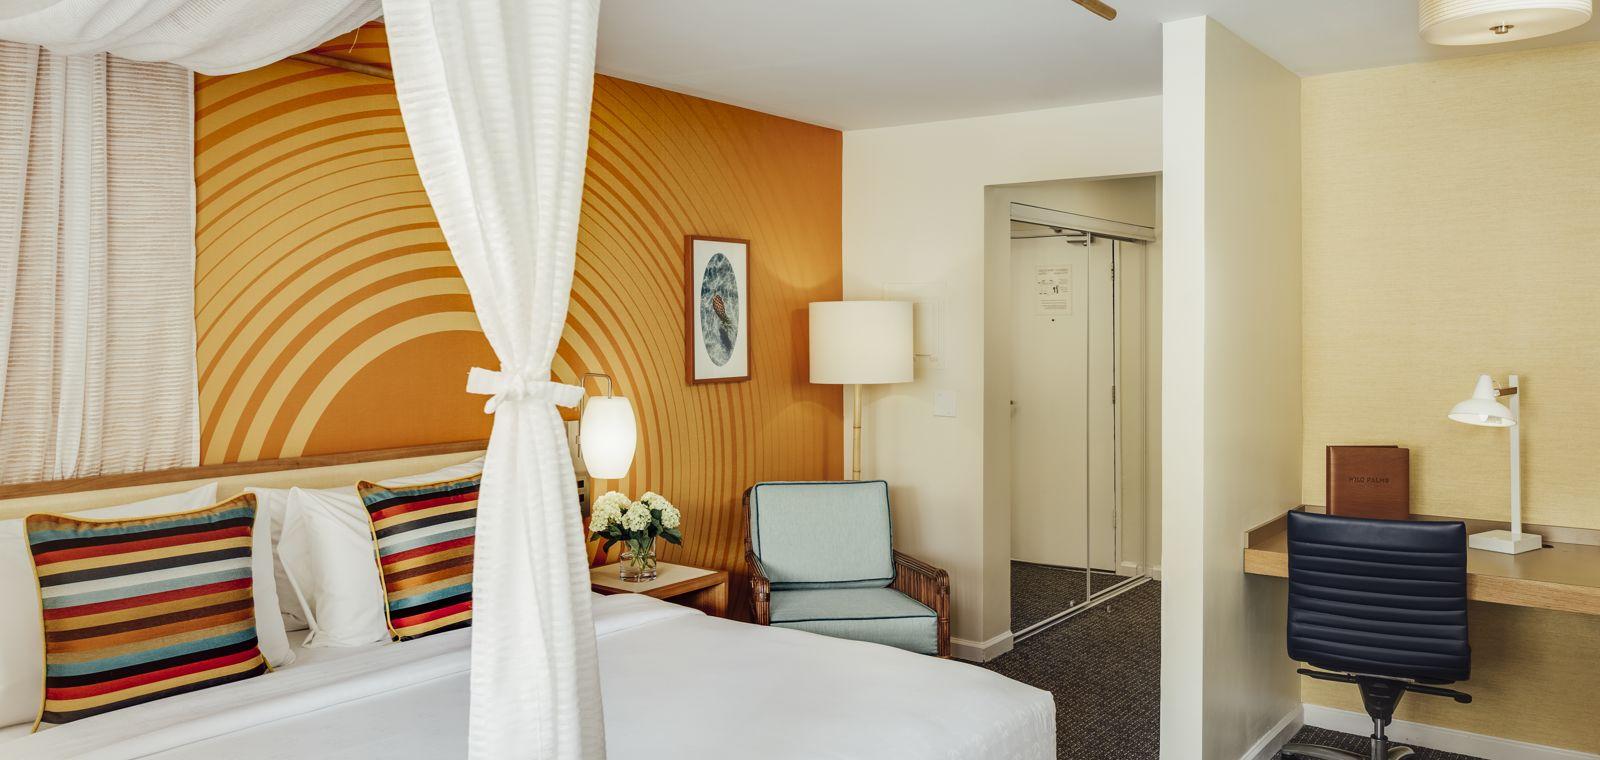 Wild Palms Hotel Sunnyvale Ca